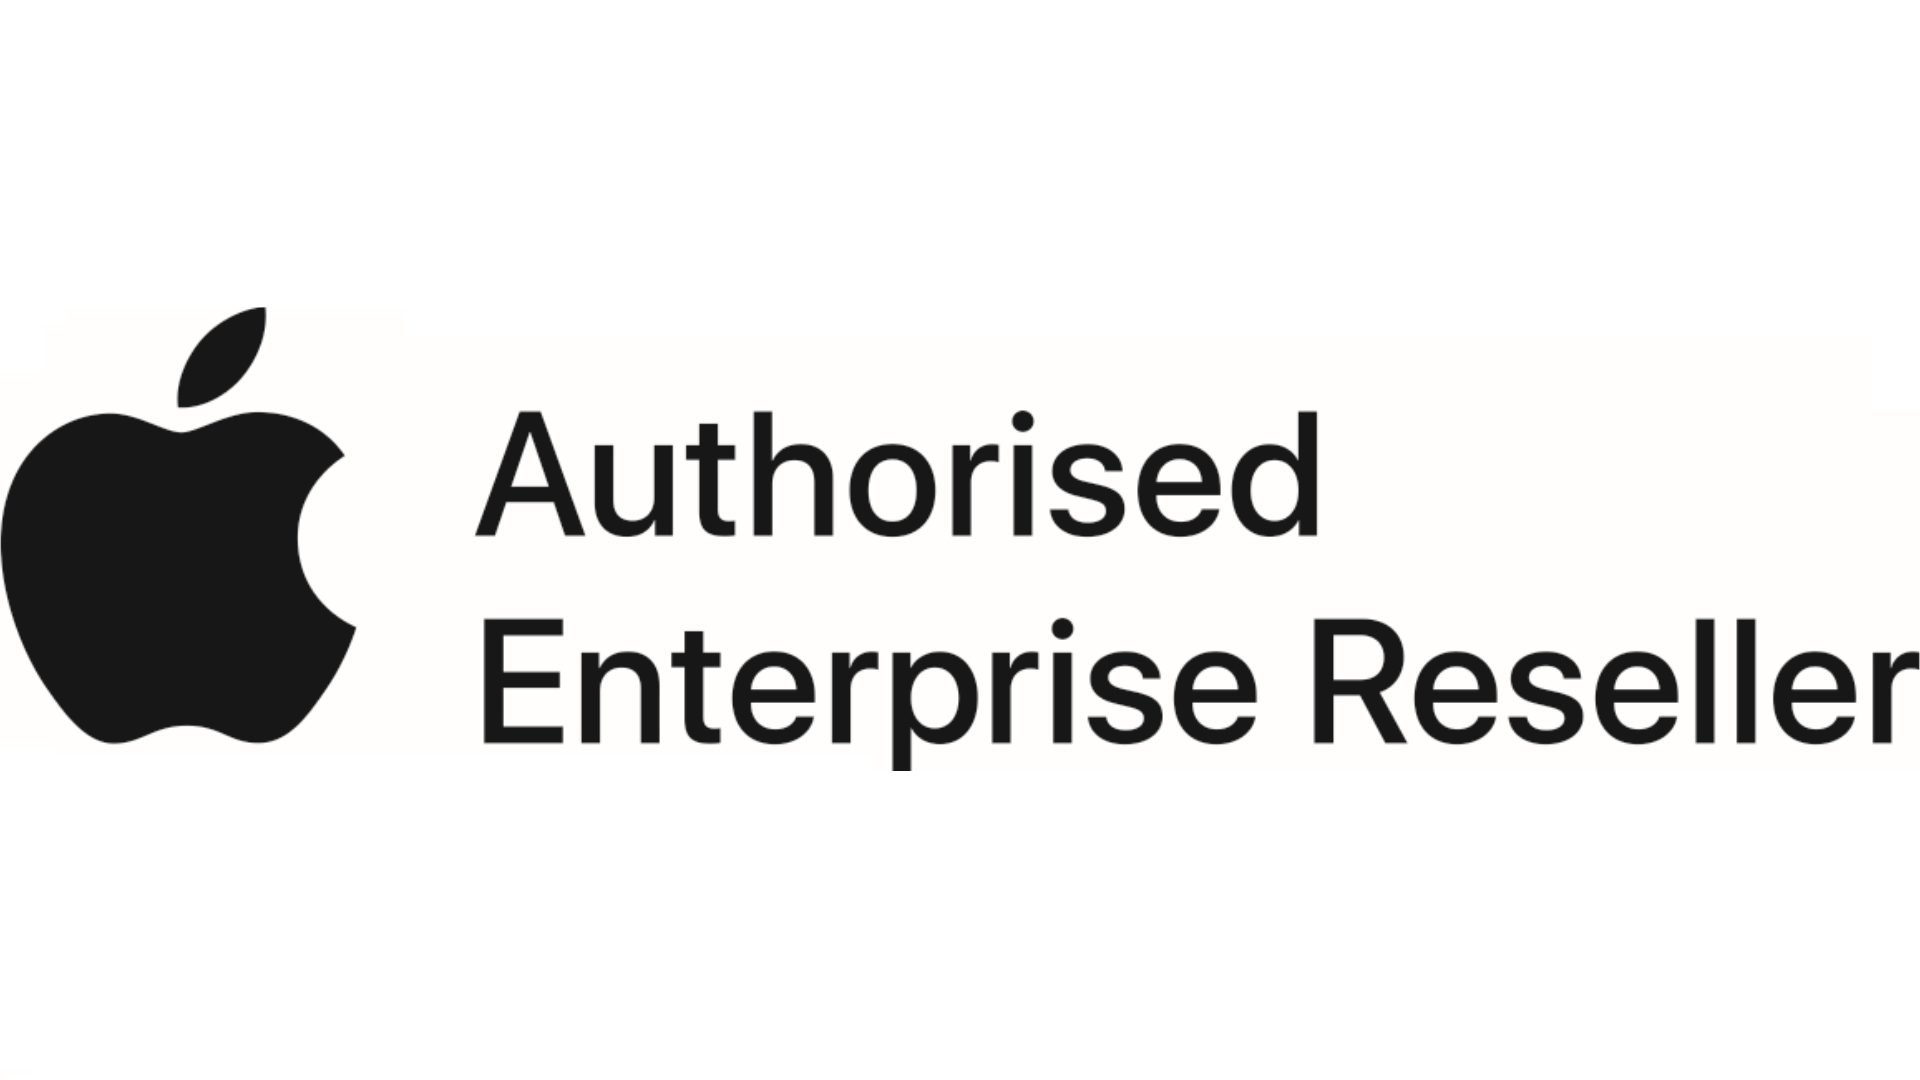 Pierwszy w Polsce Apple Authorised Enterprise Reseller